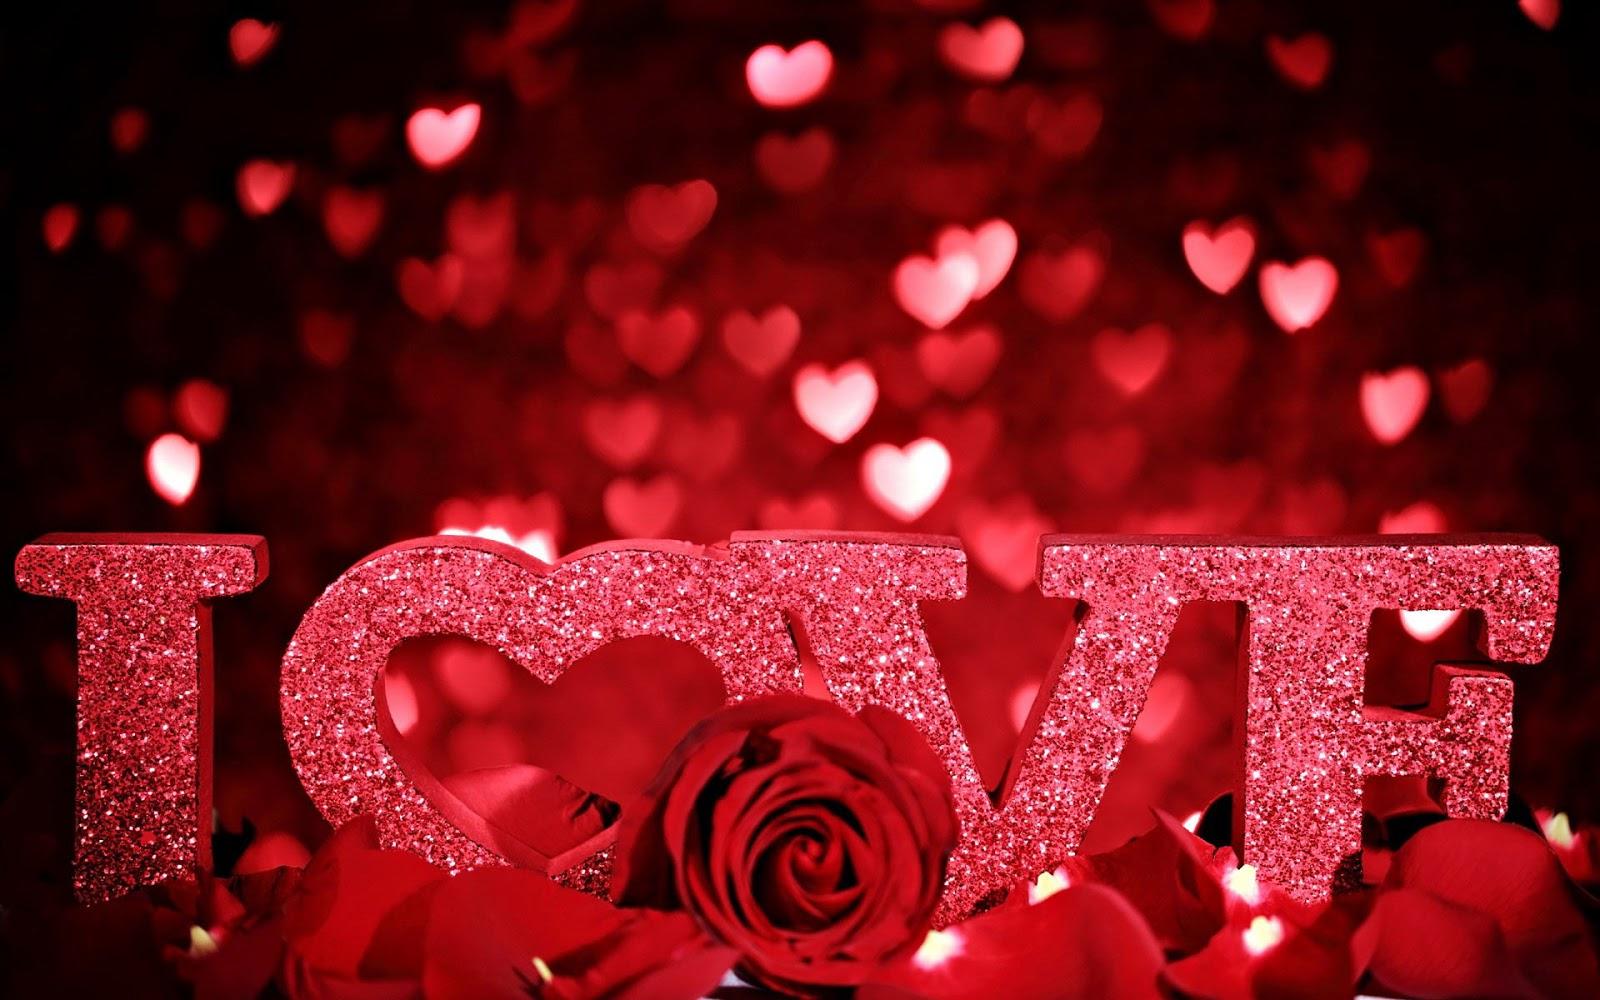 بالصور اروع صور الحب , احل و اروع صور في الحب و الغرام 3308 5